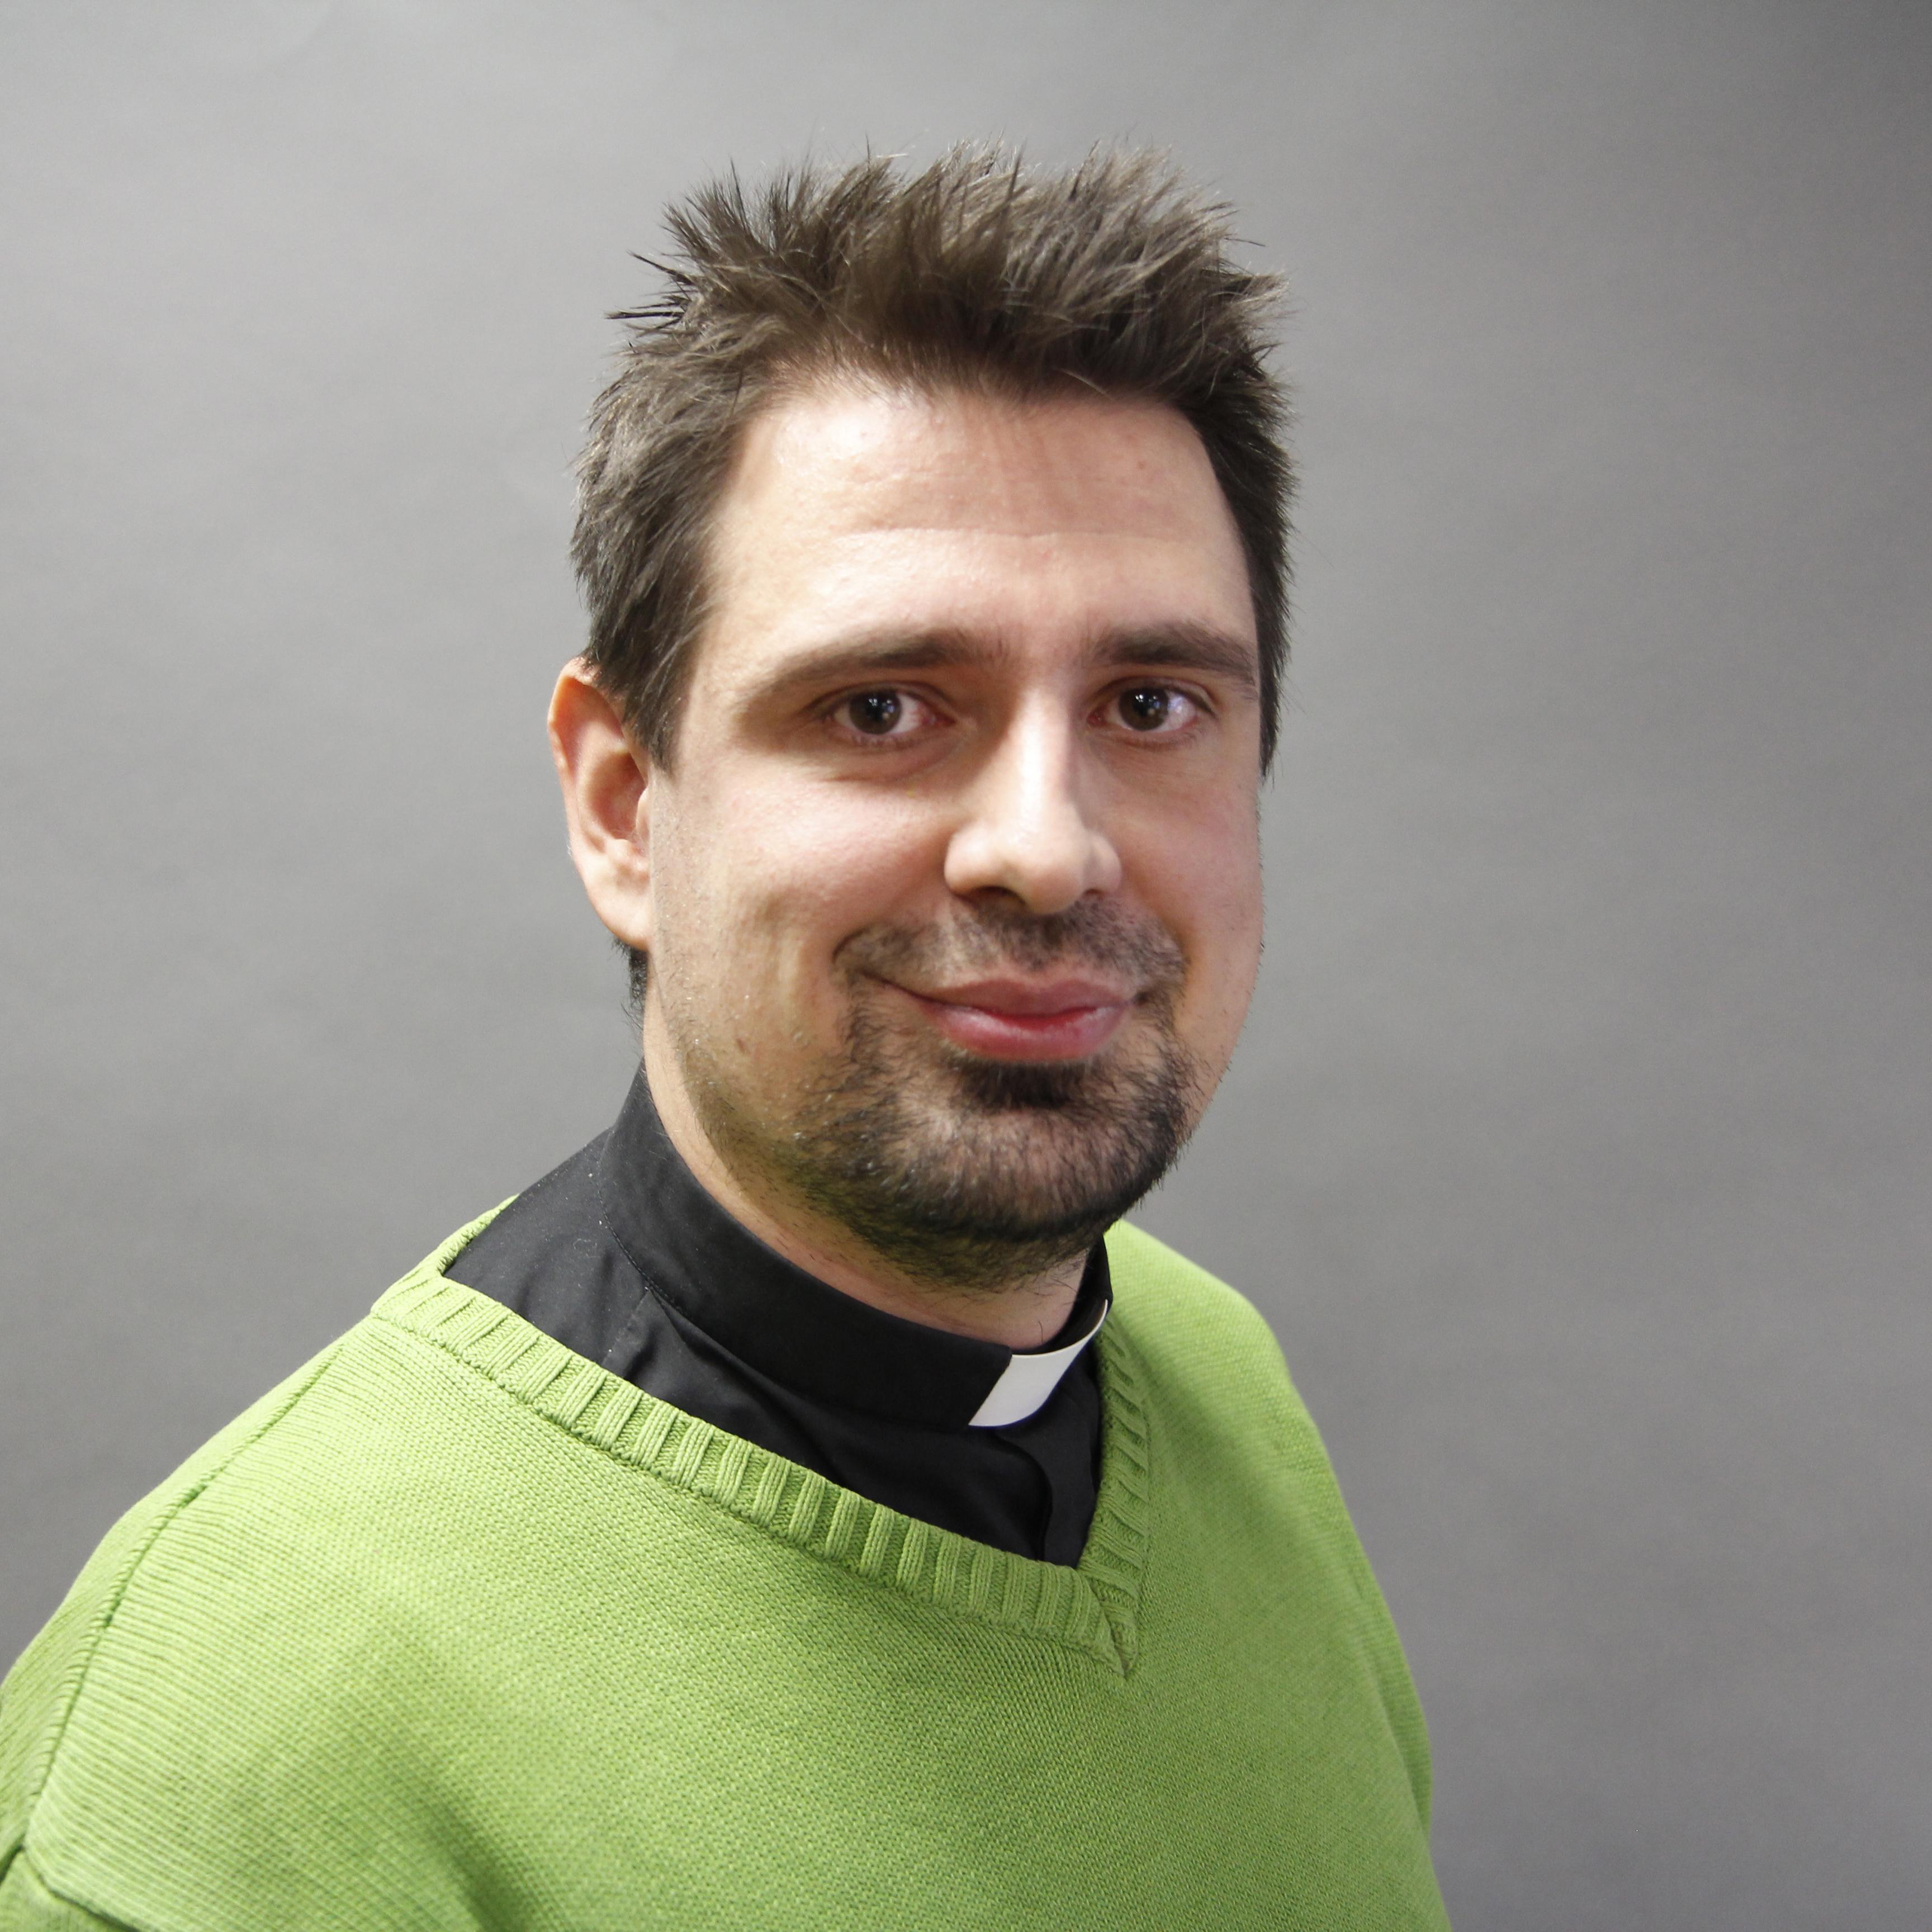 Jukka Joensuu